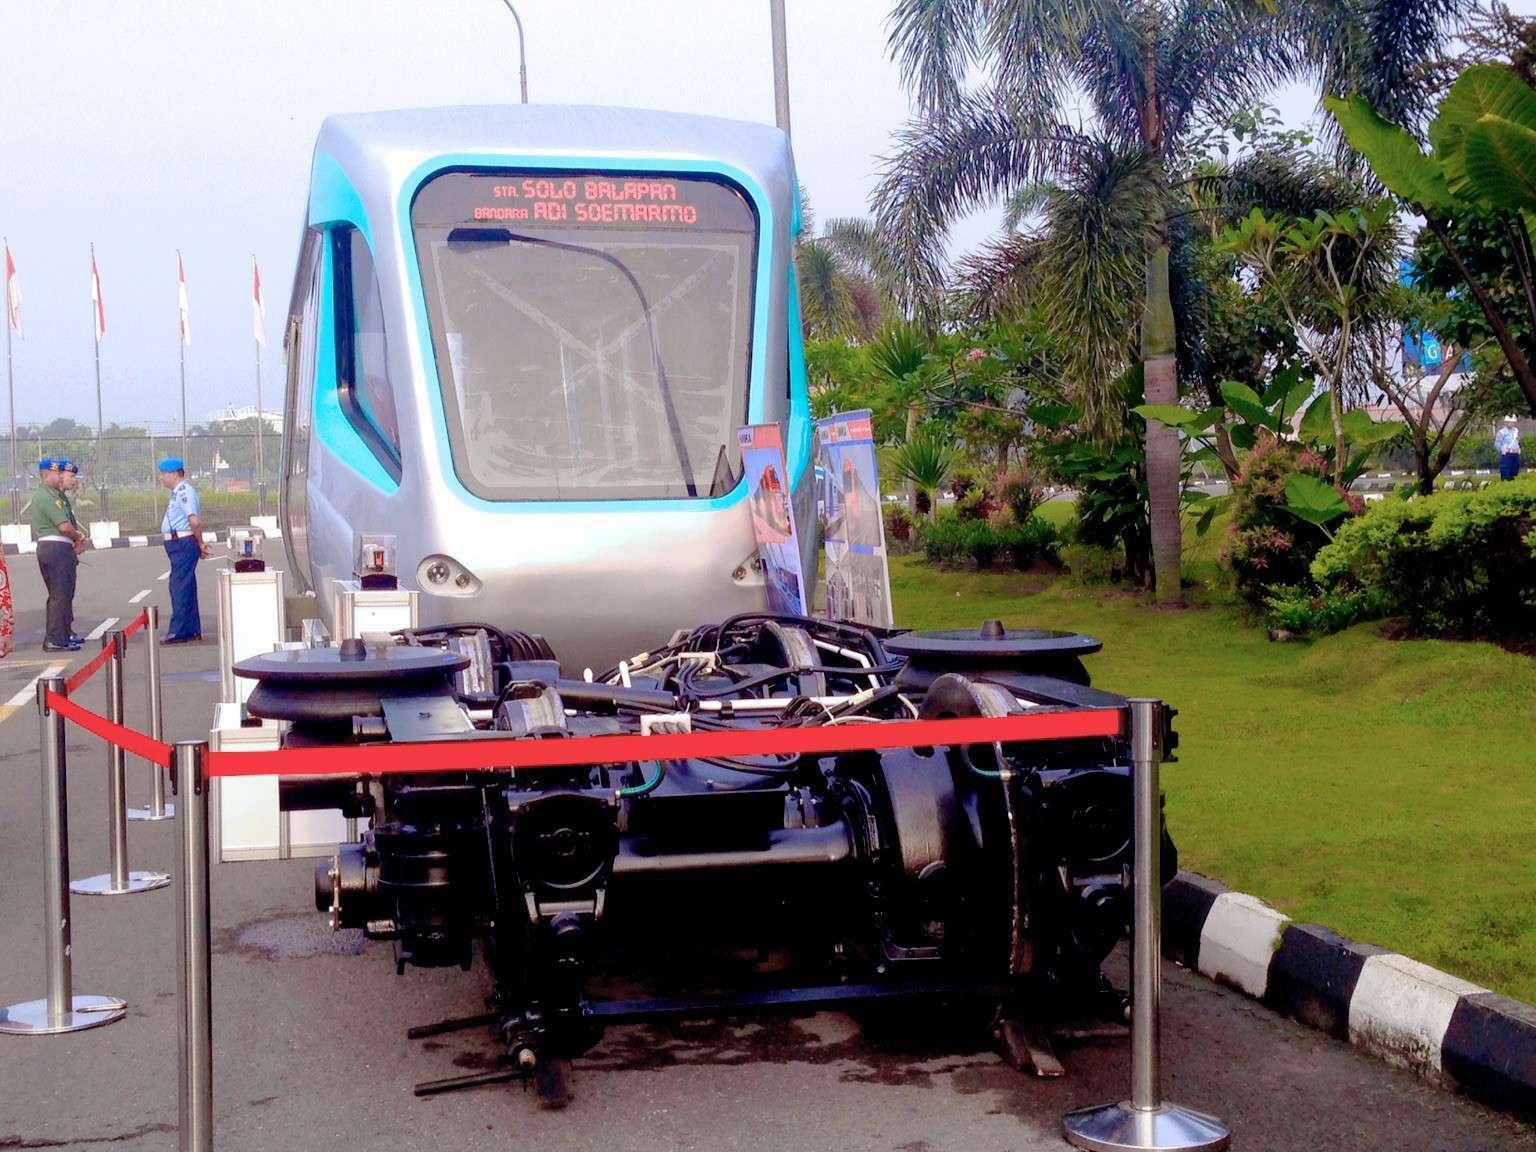 Ilustrasi: Mockup LRT Palembang yang digunakan sebagai contoh sarana KA Bandara Adi Soemarmo, Boyolali   Foto: Indra Yana